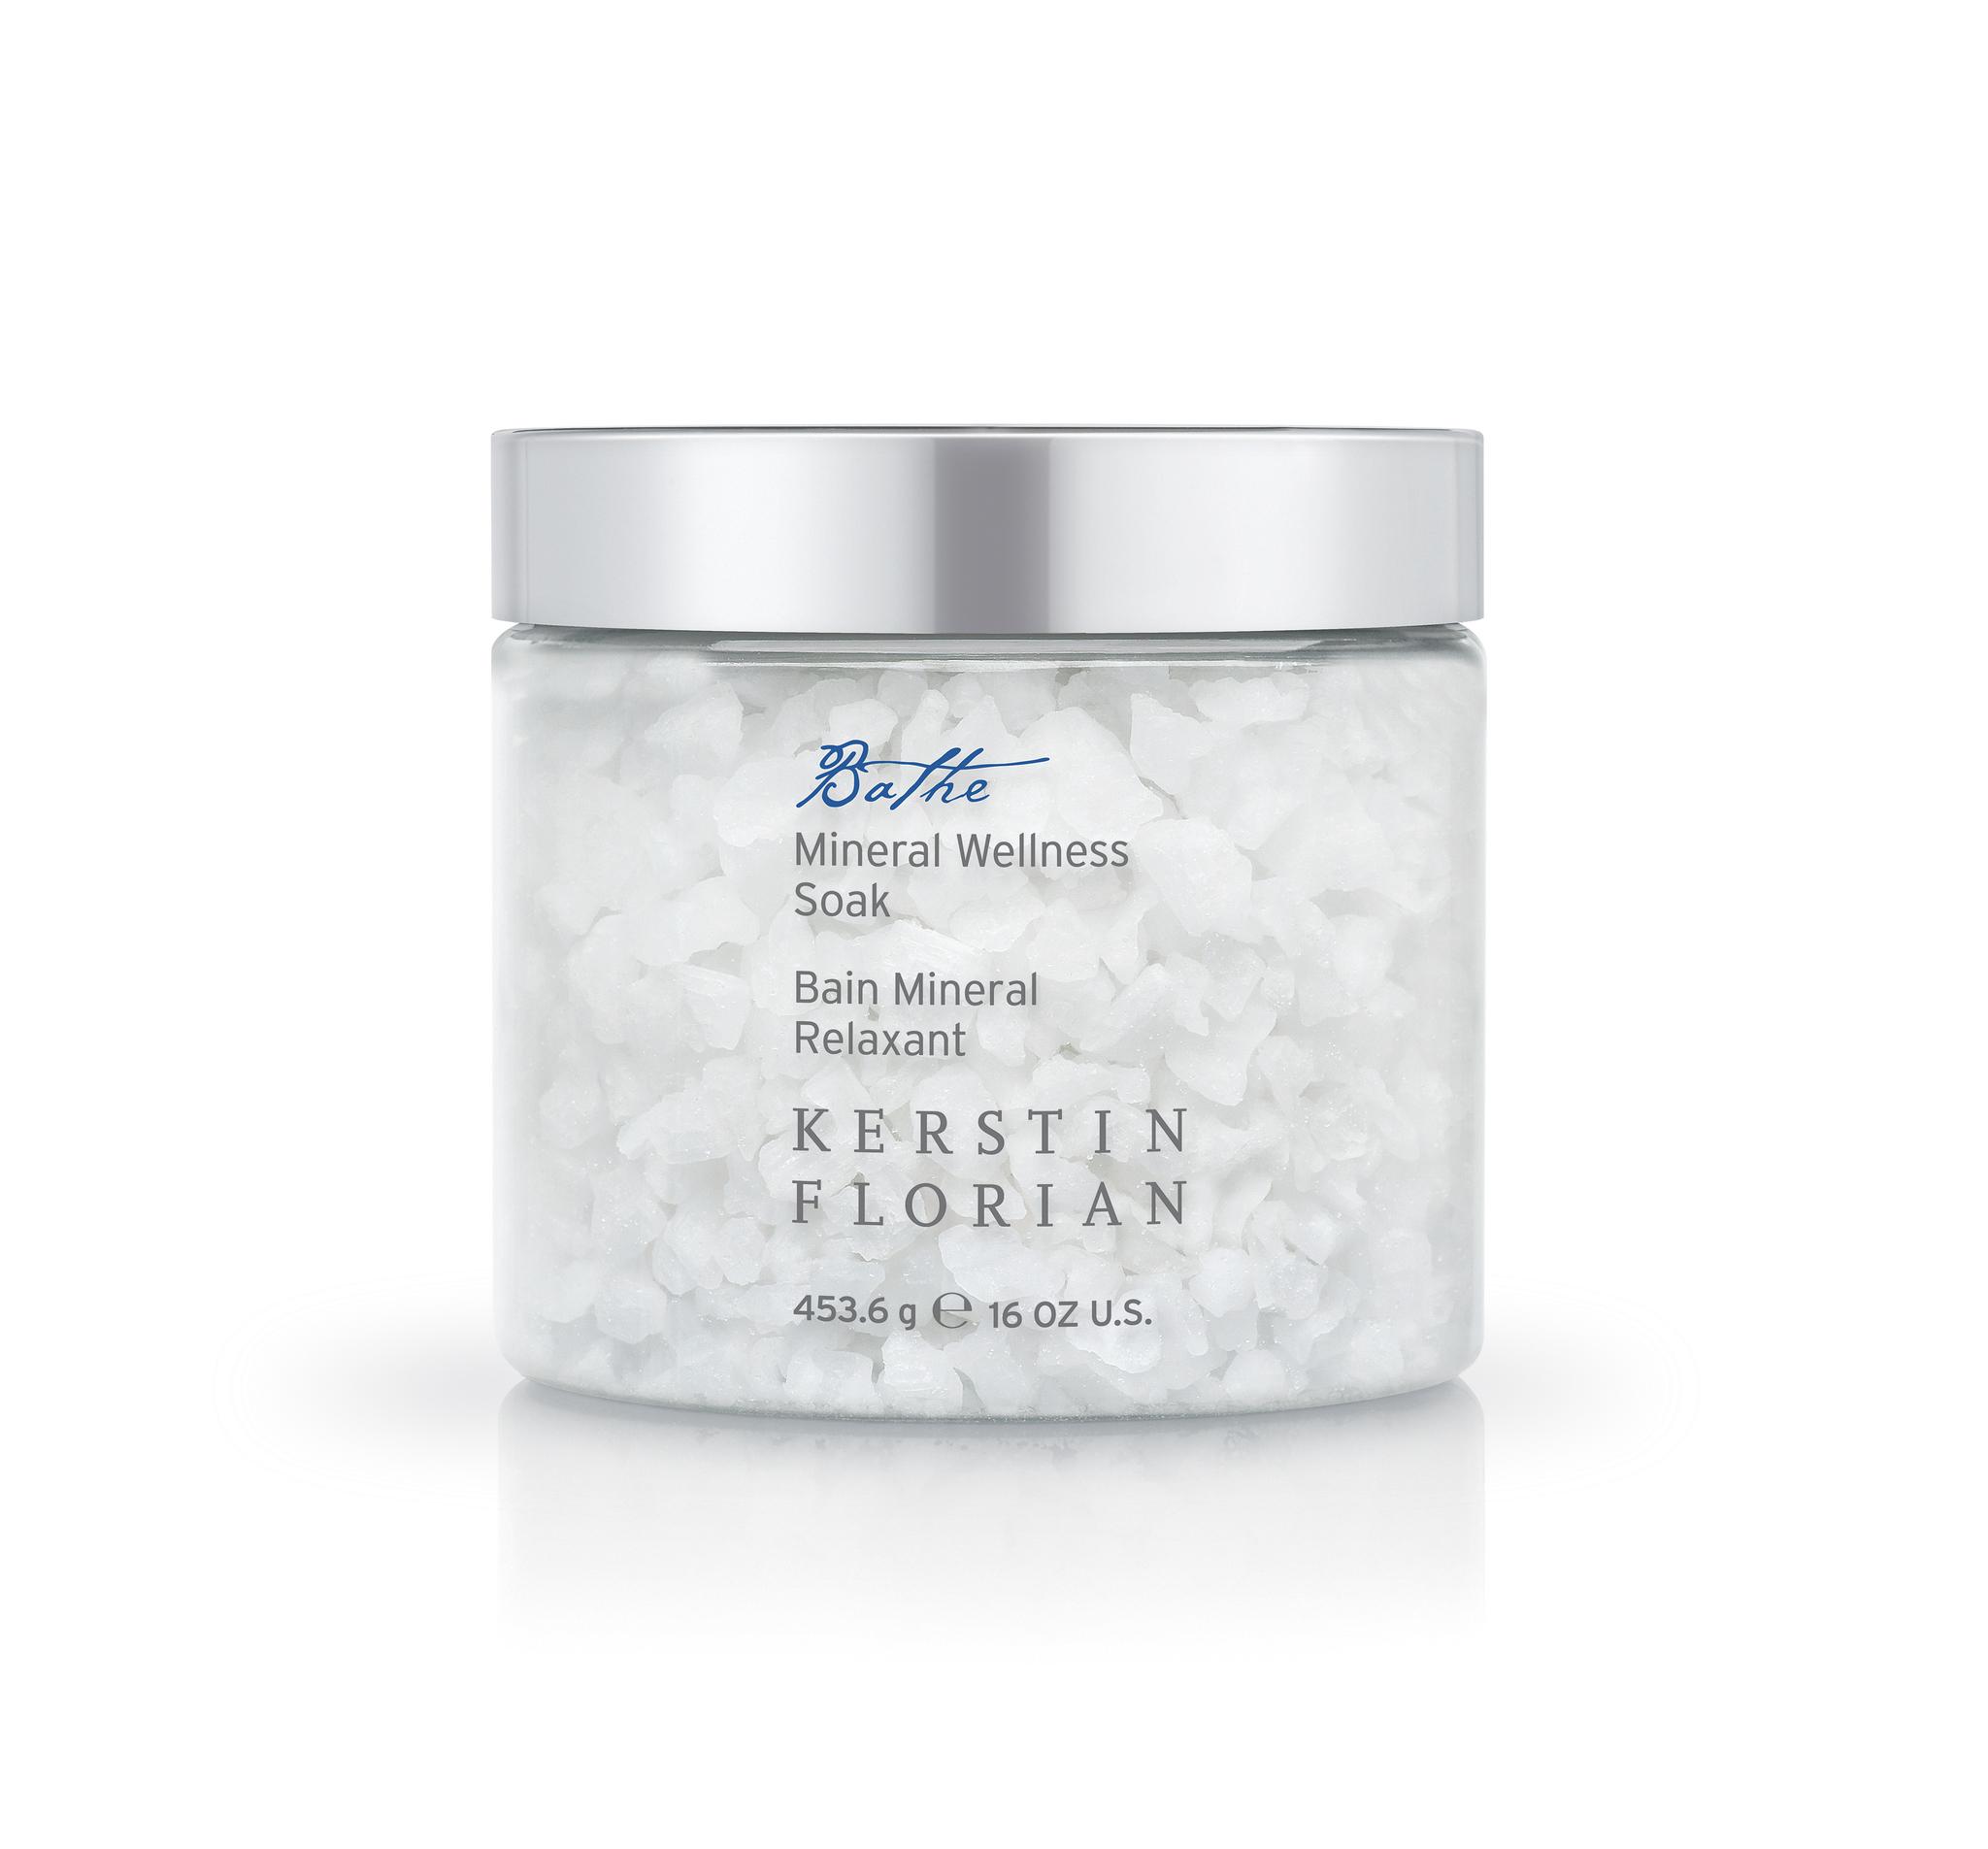 Минеральная соль для ванны/ Mineral Wellness Soak (8 ванн/453 гр.)